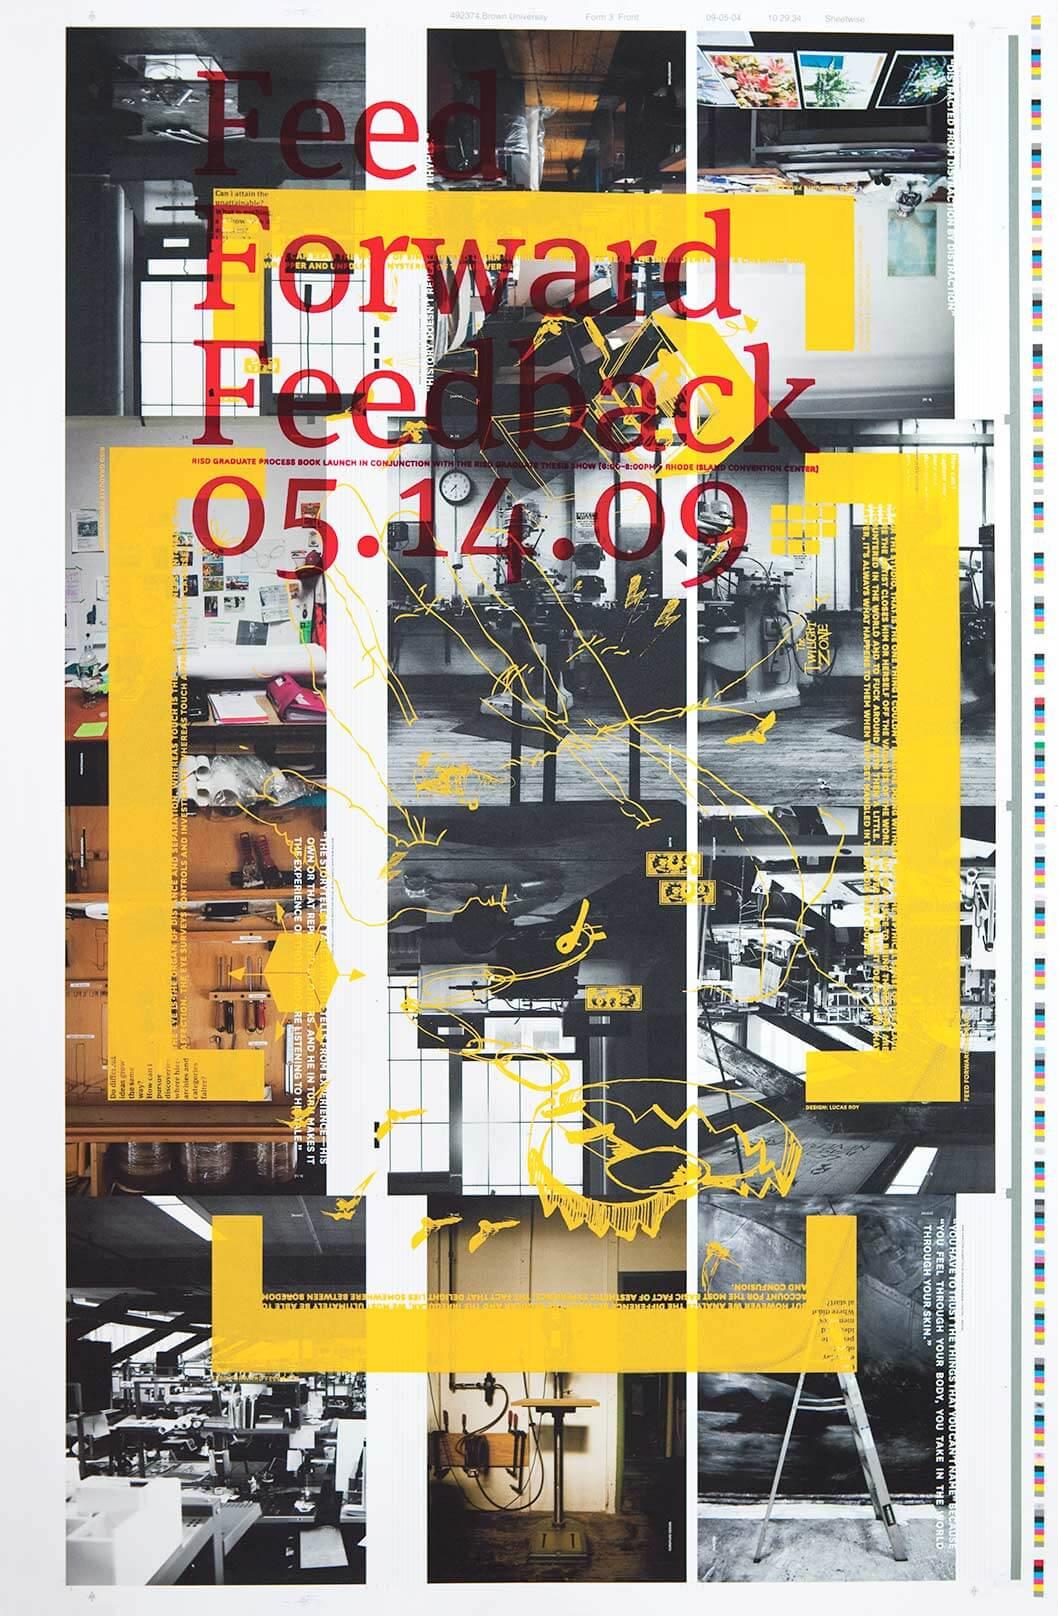 RISDFeedForwardFeedback-19_poster1